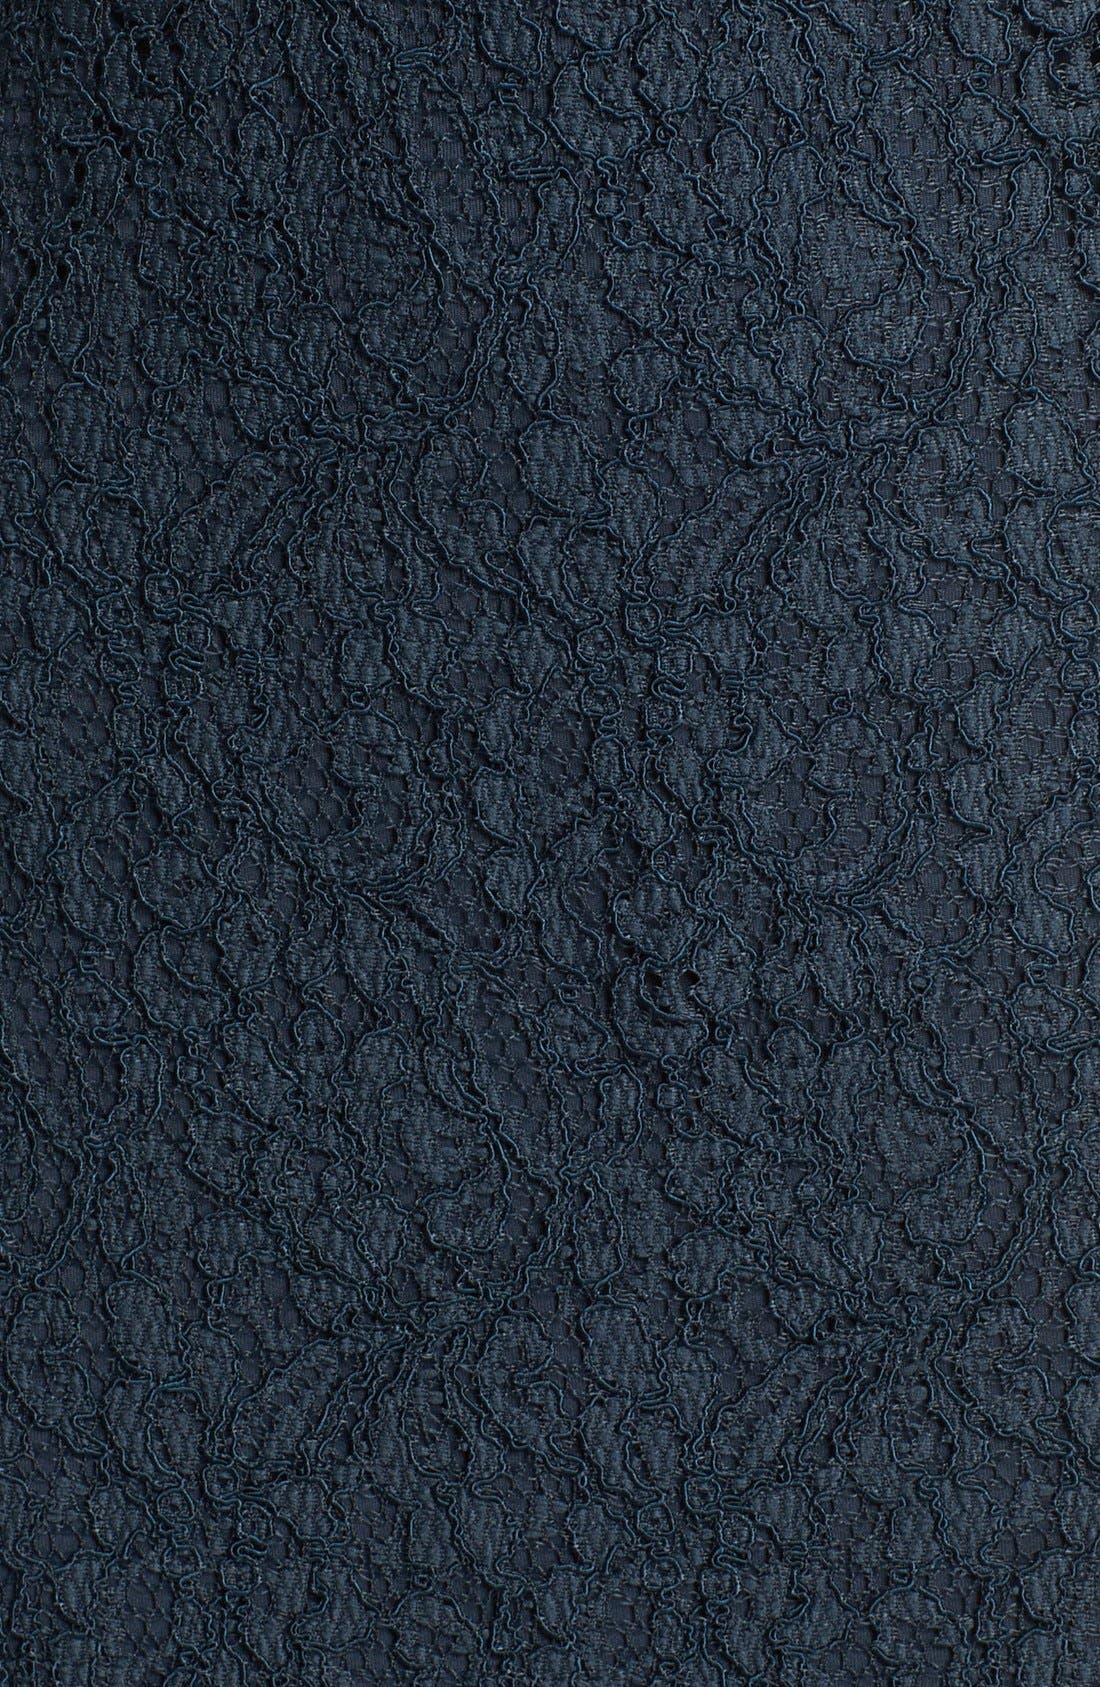 Boatneck Lace Sheath Dress,                             Alternate thumbnail 101, color,